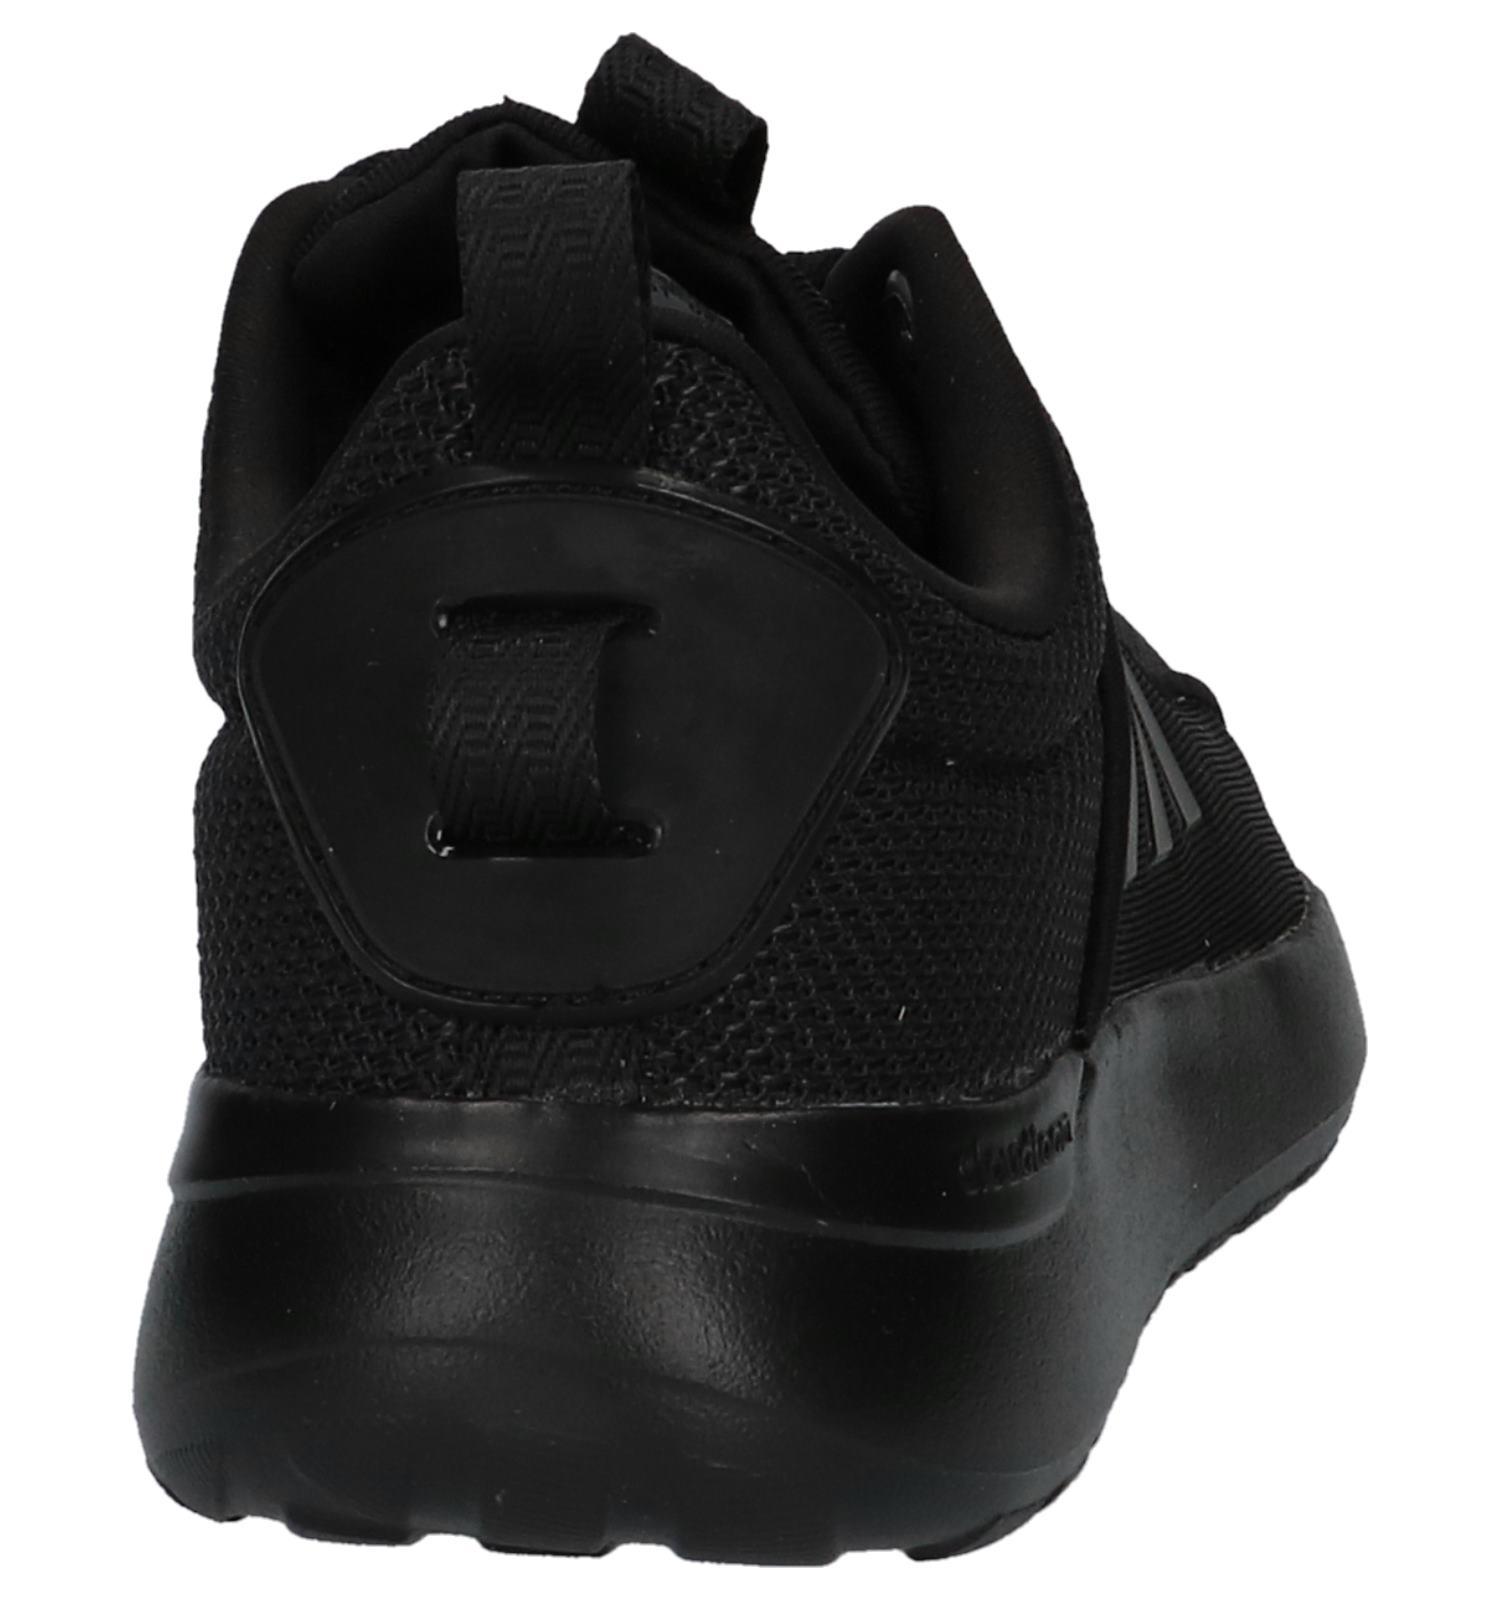 outlet store 9dc50 03dd9 Zwarte adidas Cloudfoam Lite Racer Sneakers  TORFS.BE  Gratis verzend en  retour